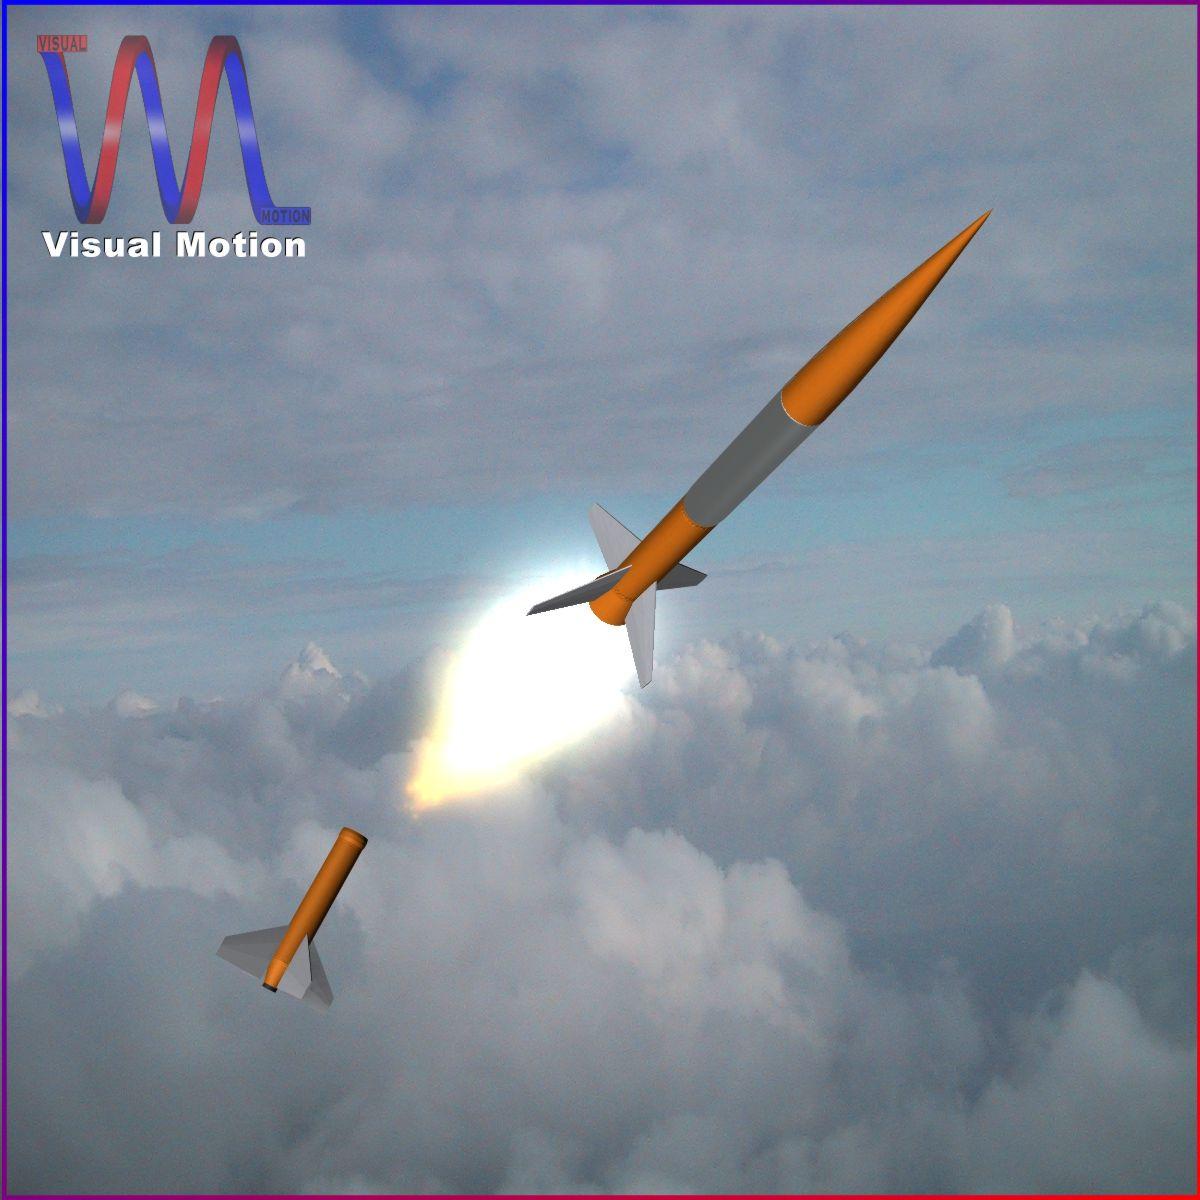 gamma centauro rocket 3d model 3ds dxf fbx blend cob dae x obj 218200